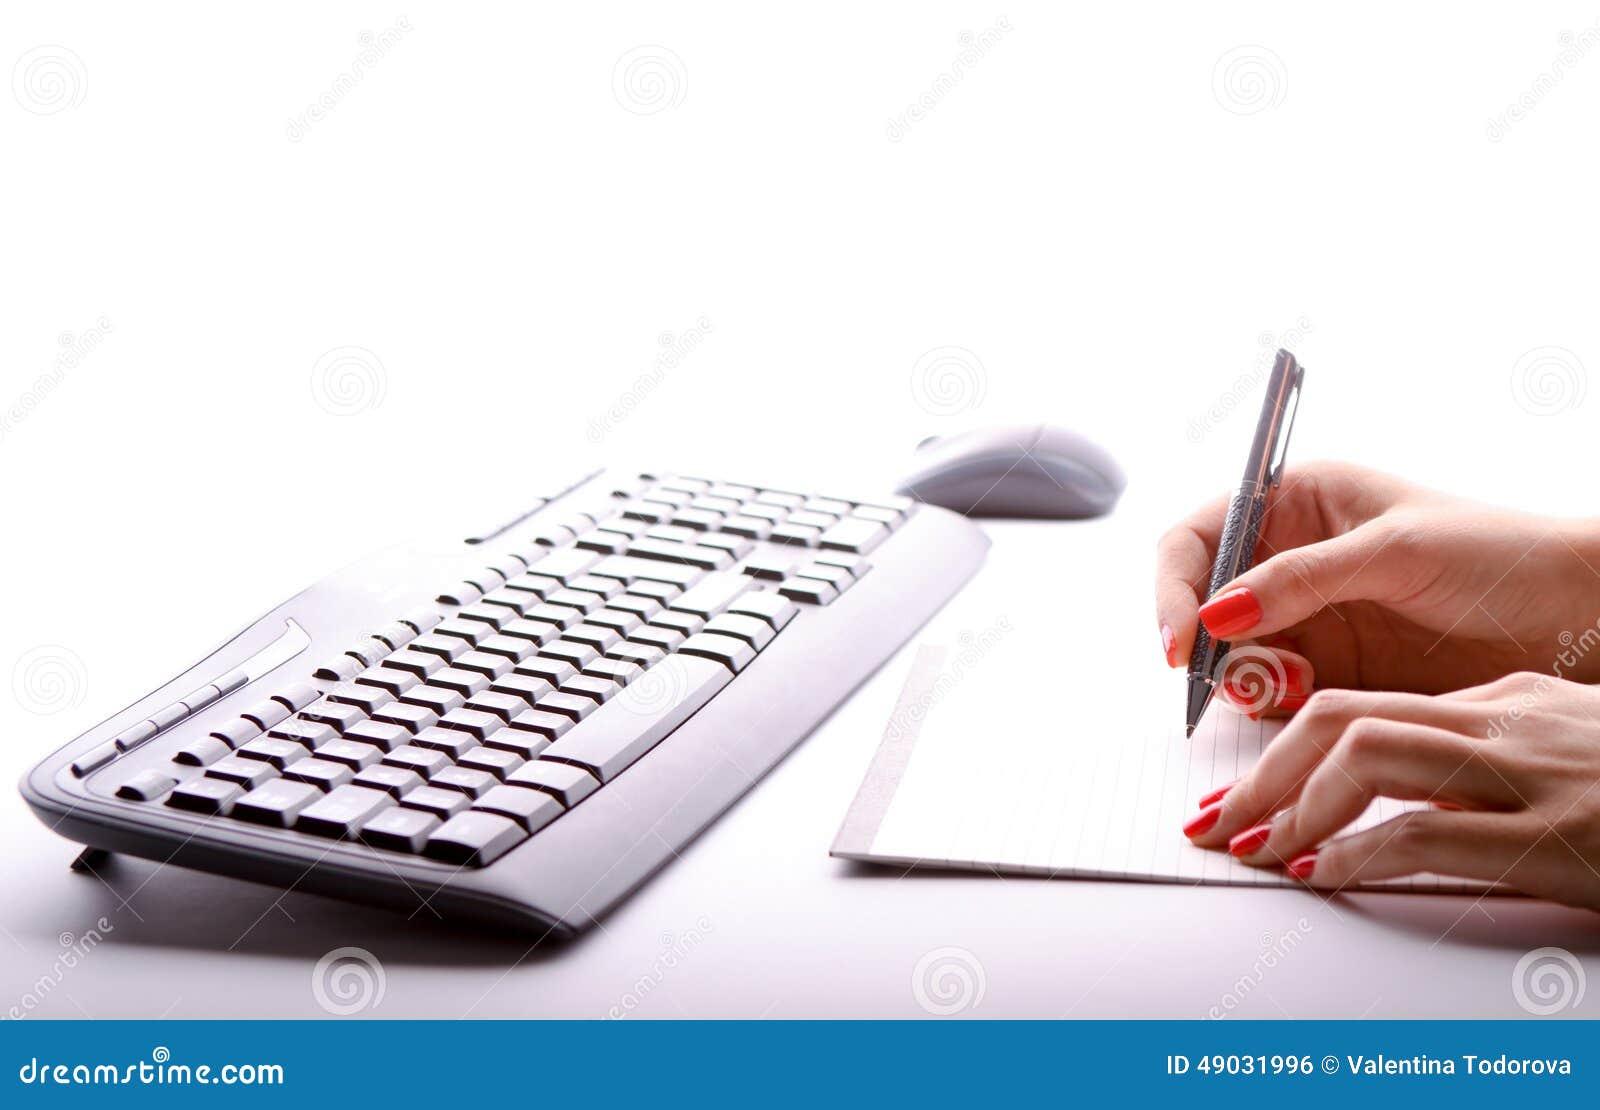 long time web writing expert - 750×478